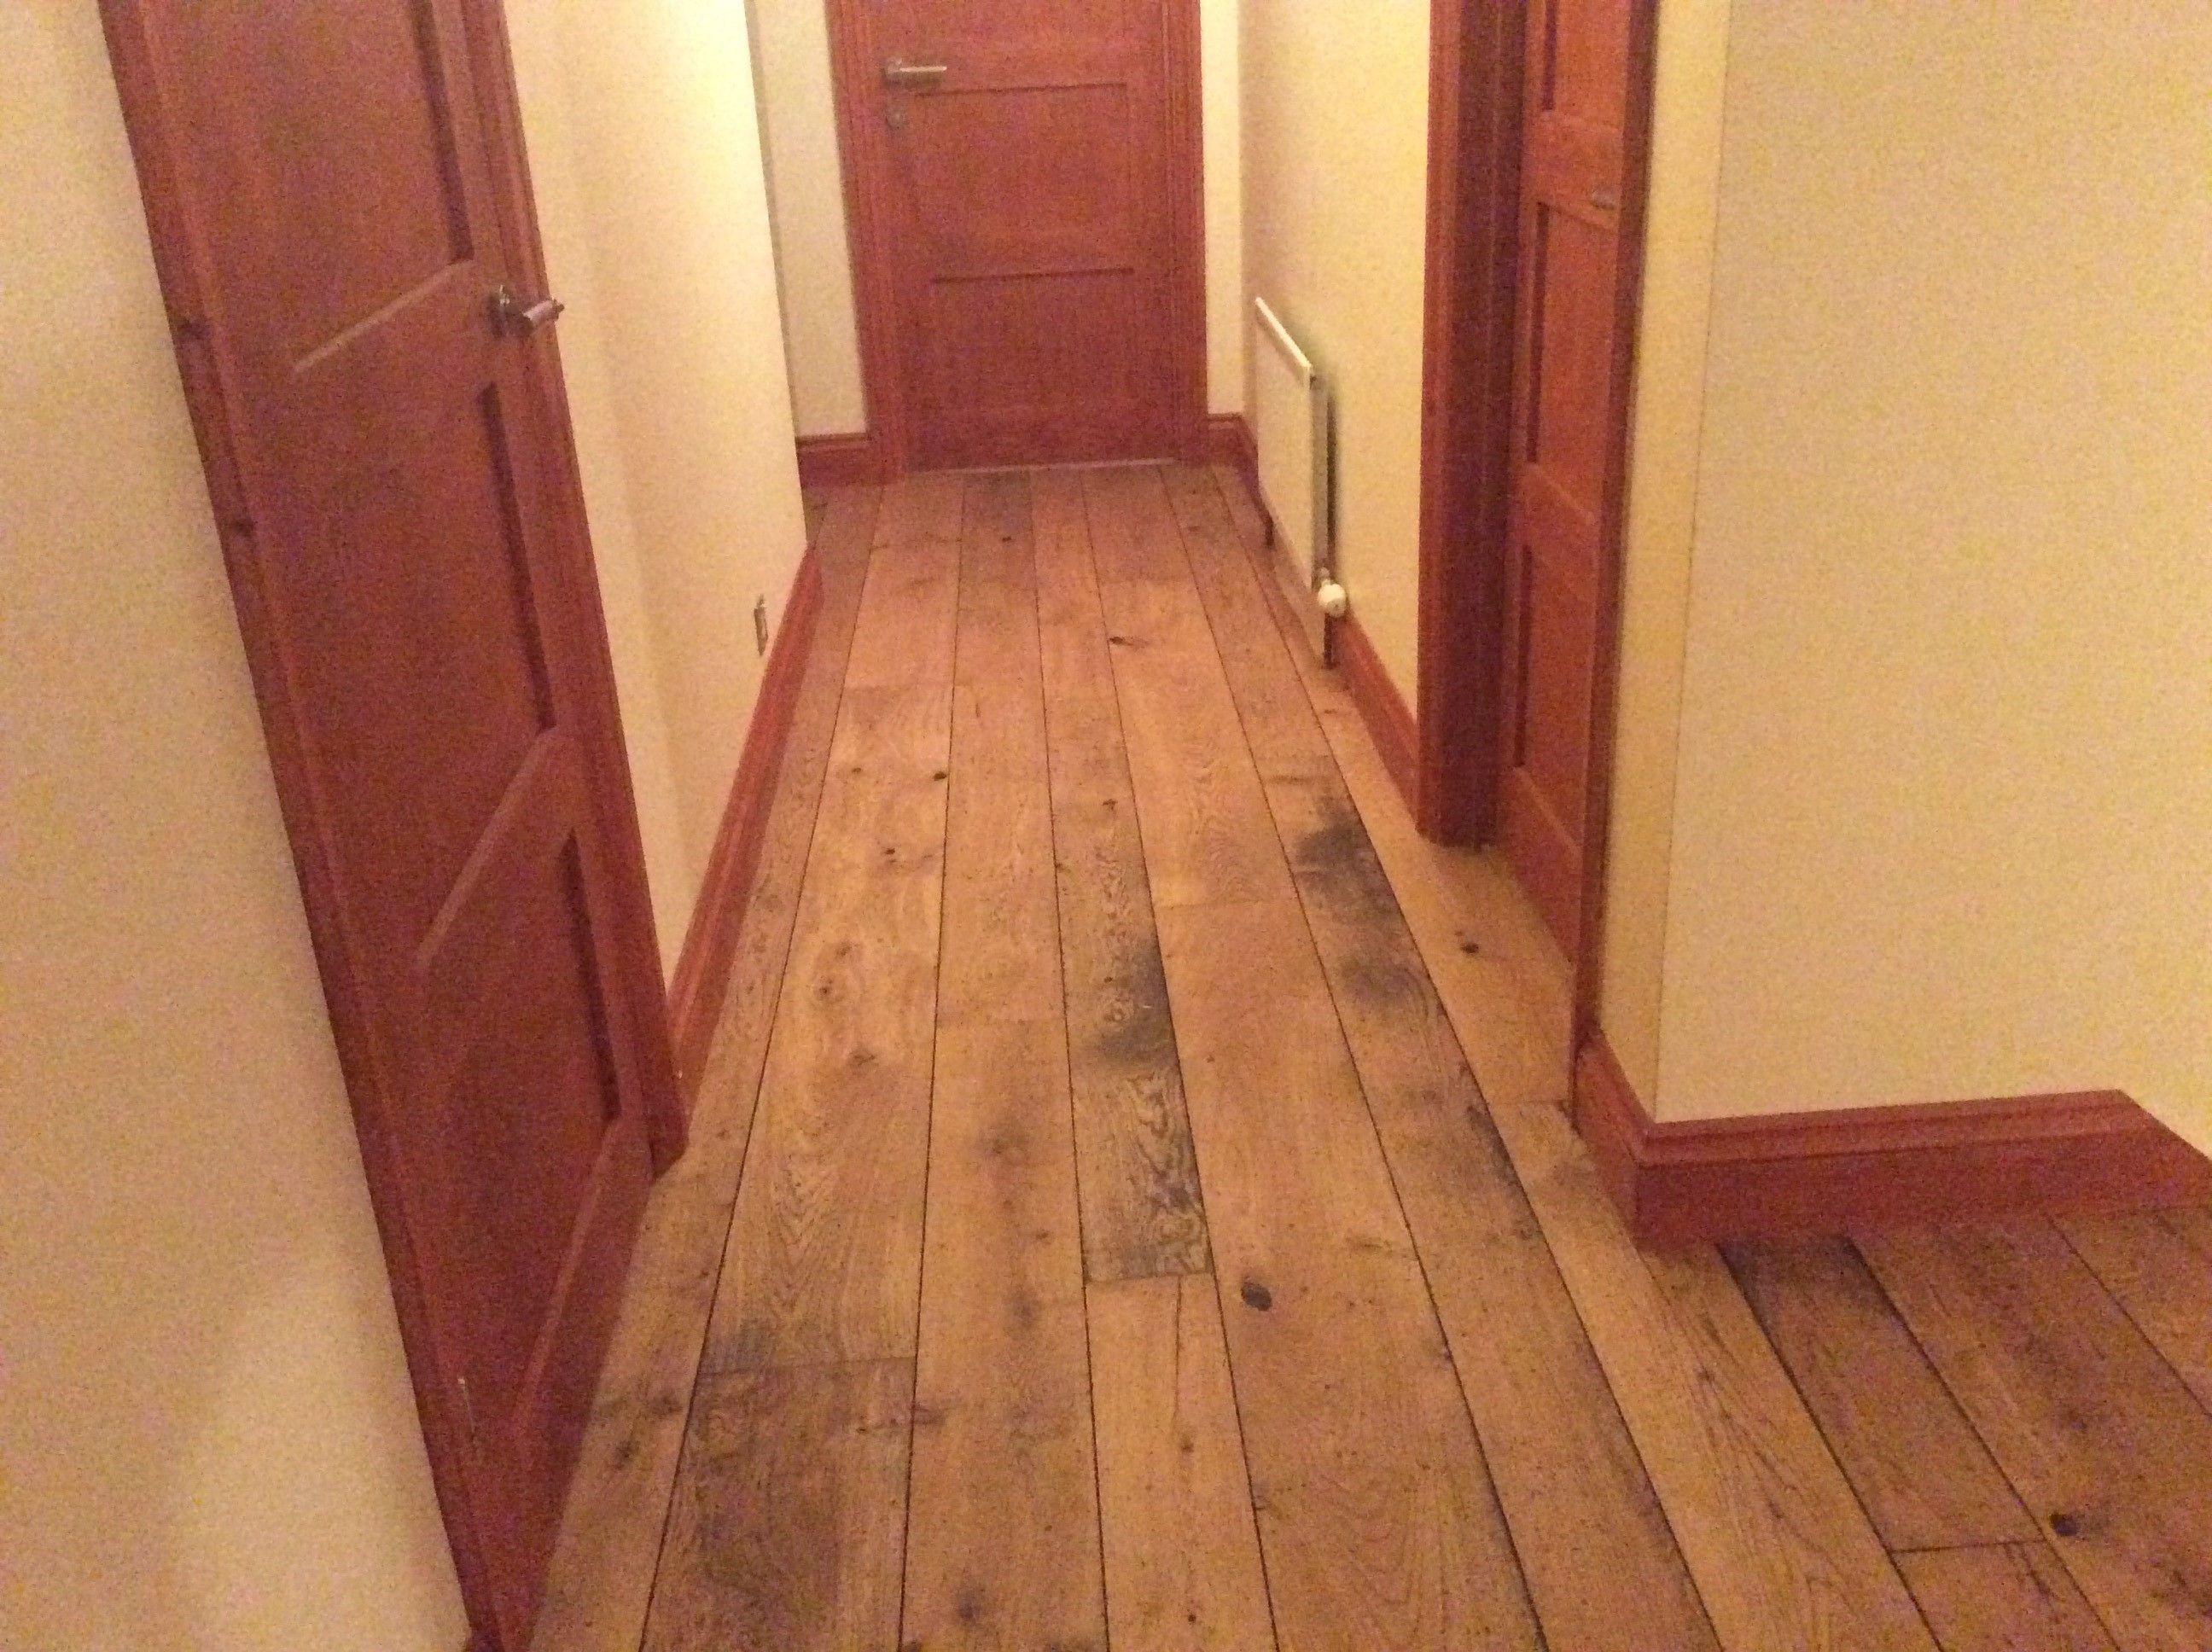 distressed hardwood flooring cost of distressed wood flooring kronotex amazon harbour oak floor plan ideas inside distressed wood flooring mixed width engineered oak aged and distressed orange tree